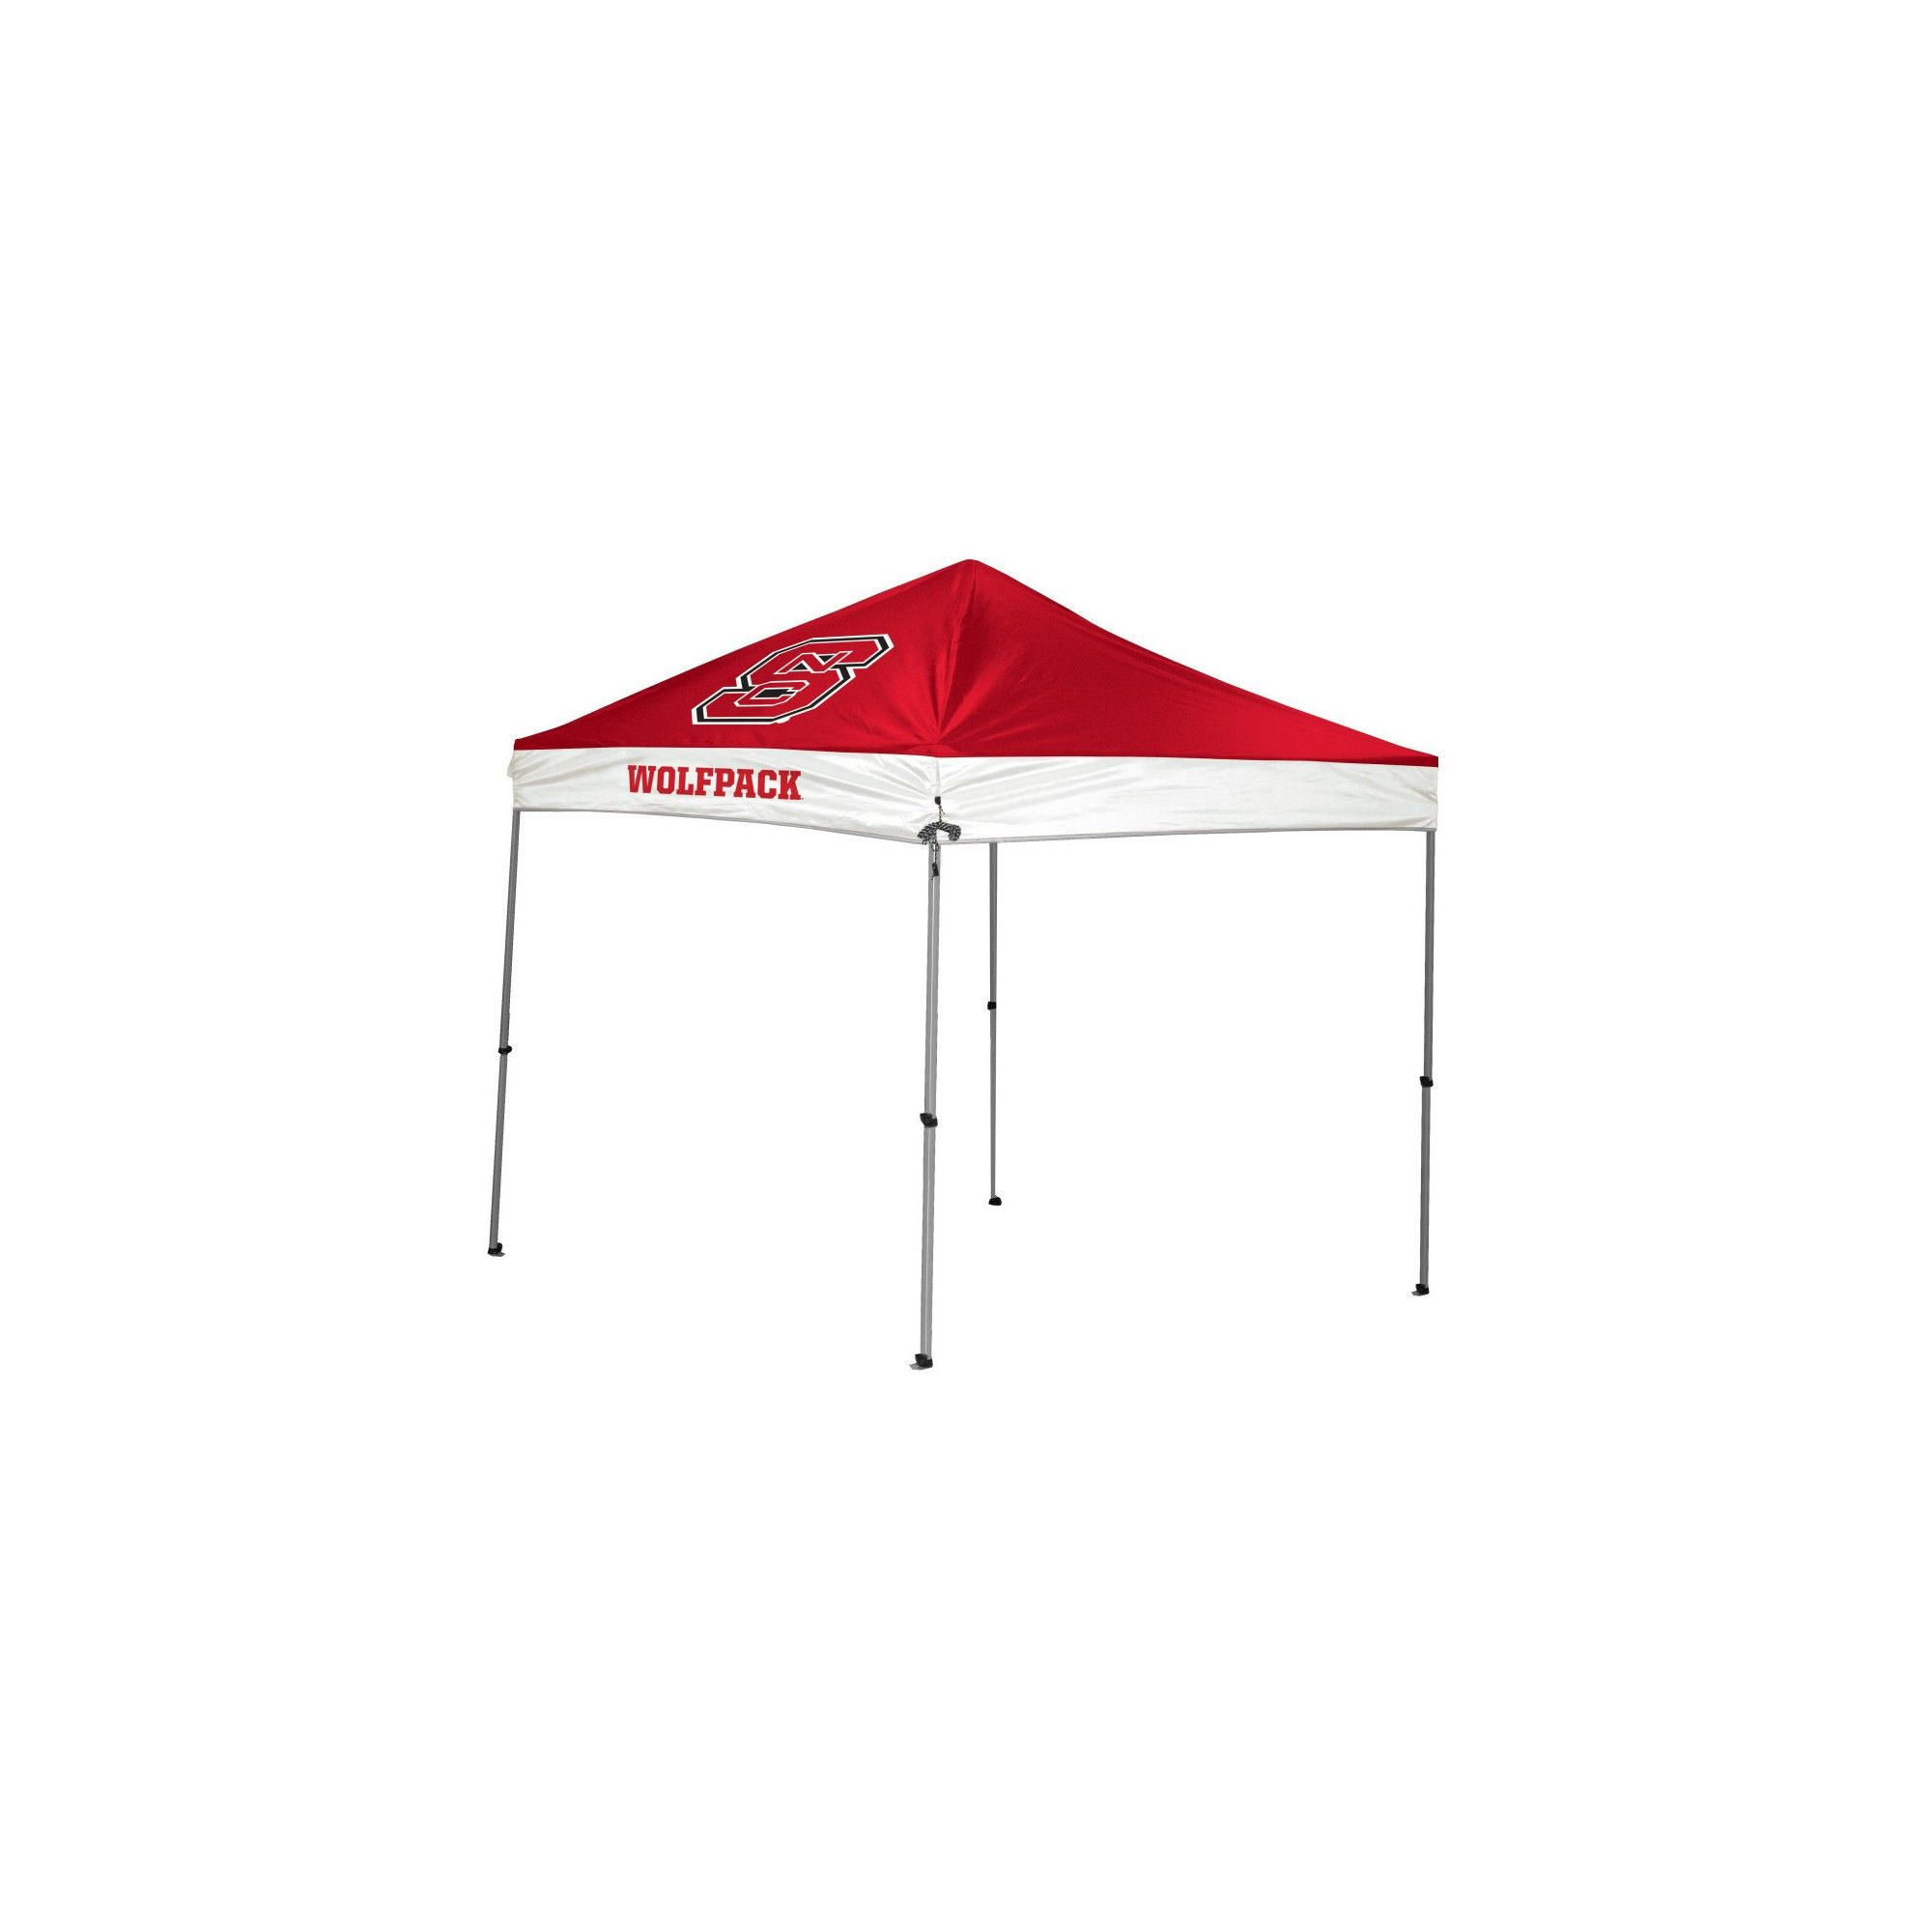 NCAA Rawlings 9u0027x9u0027 Pop Up Canopy Tent NC State Wolfpack  sc 1 st  Pinterest & NCAA Rawlings 9u0027x9u0027 Pop Up Canopy Tent NC State Wolfpack | Canopy ...